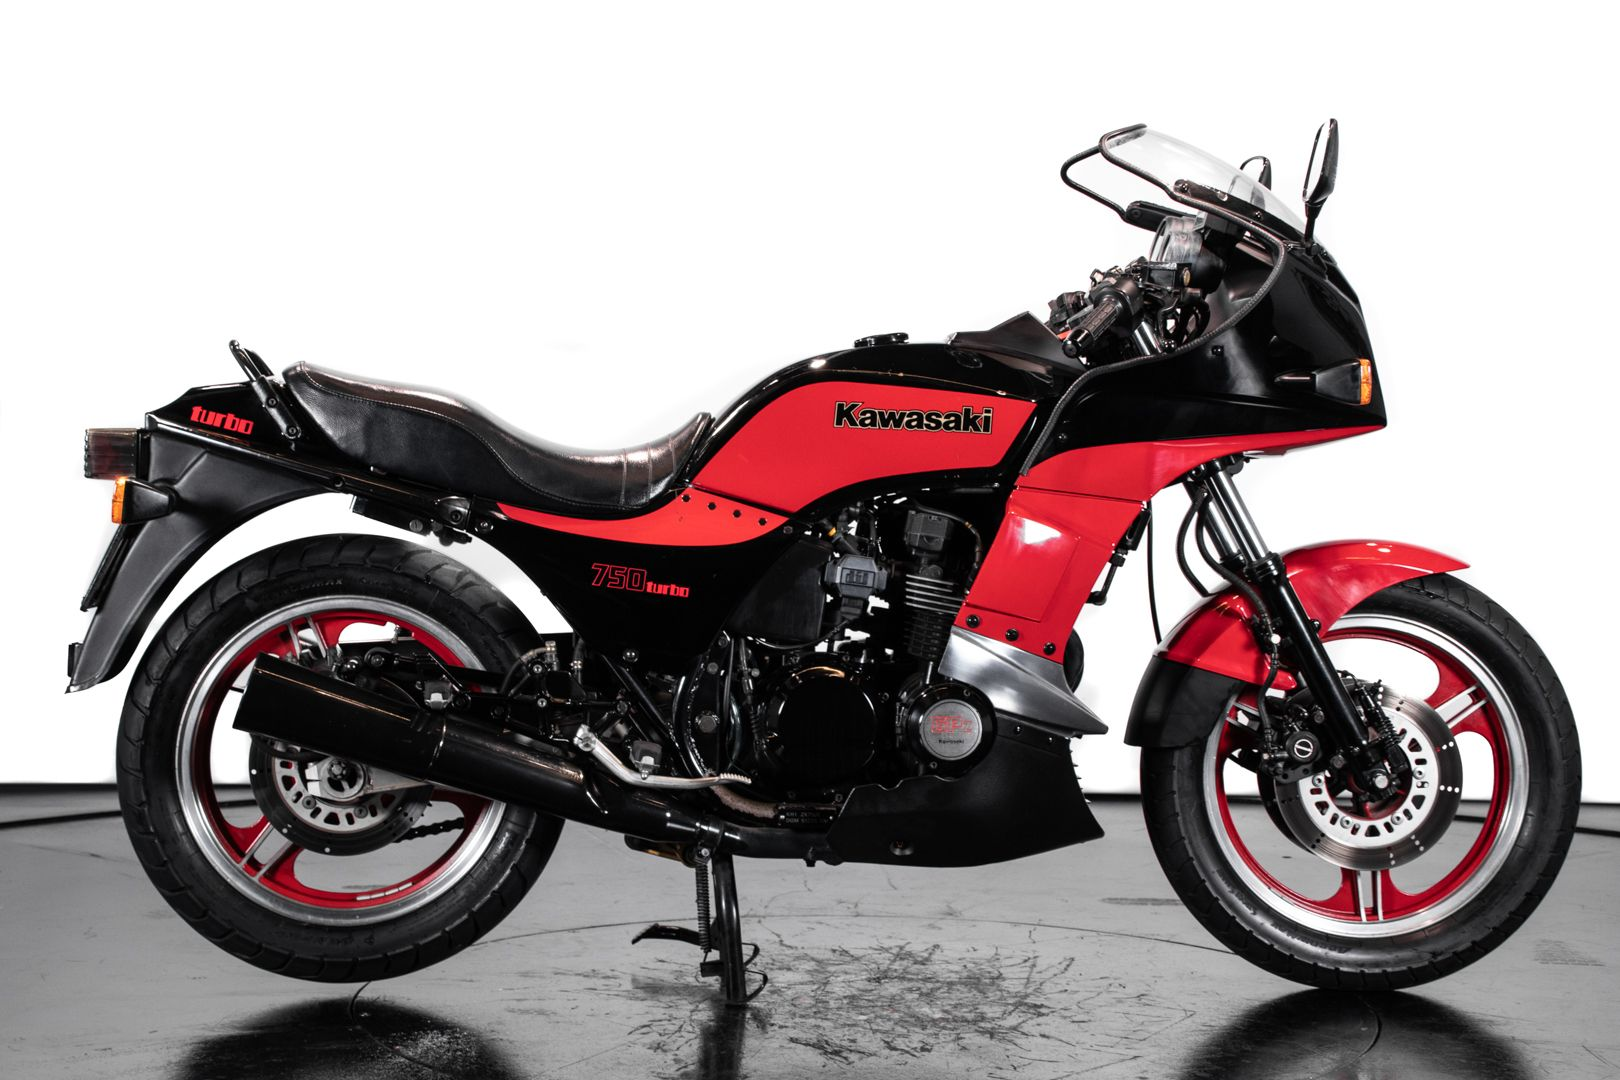 1985 Kawasaki Turbo 750 84964